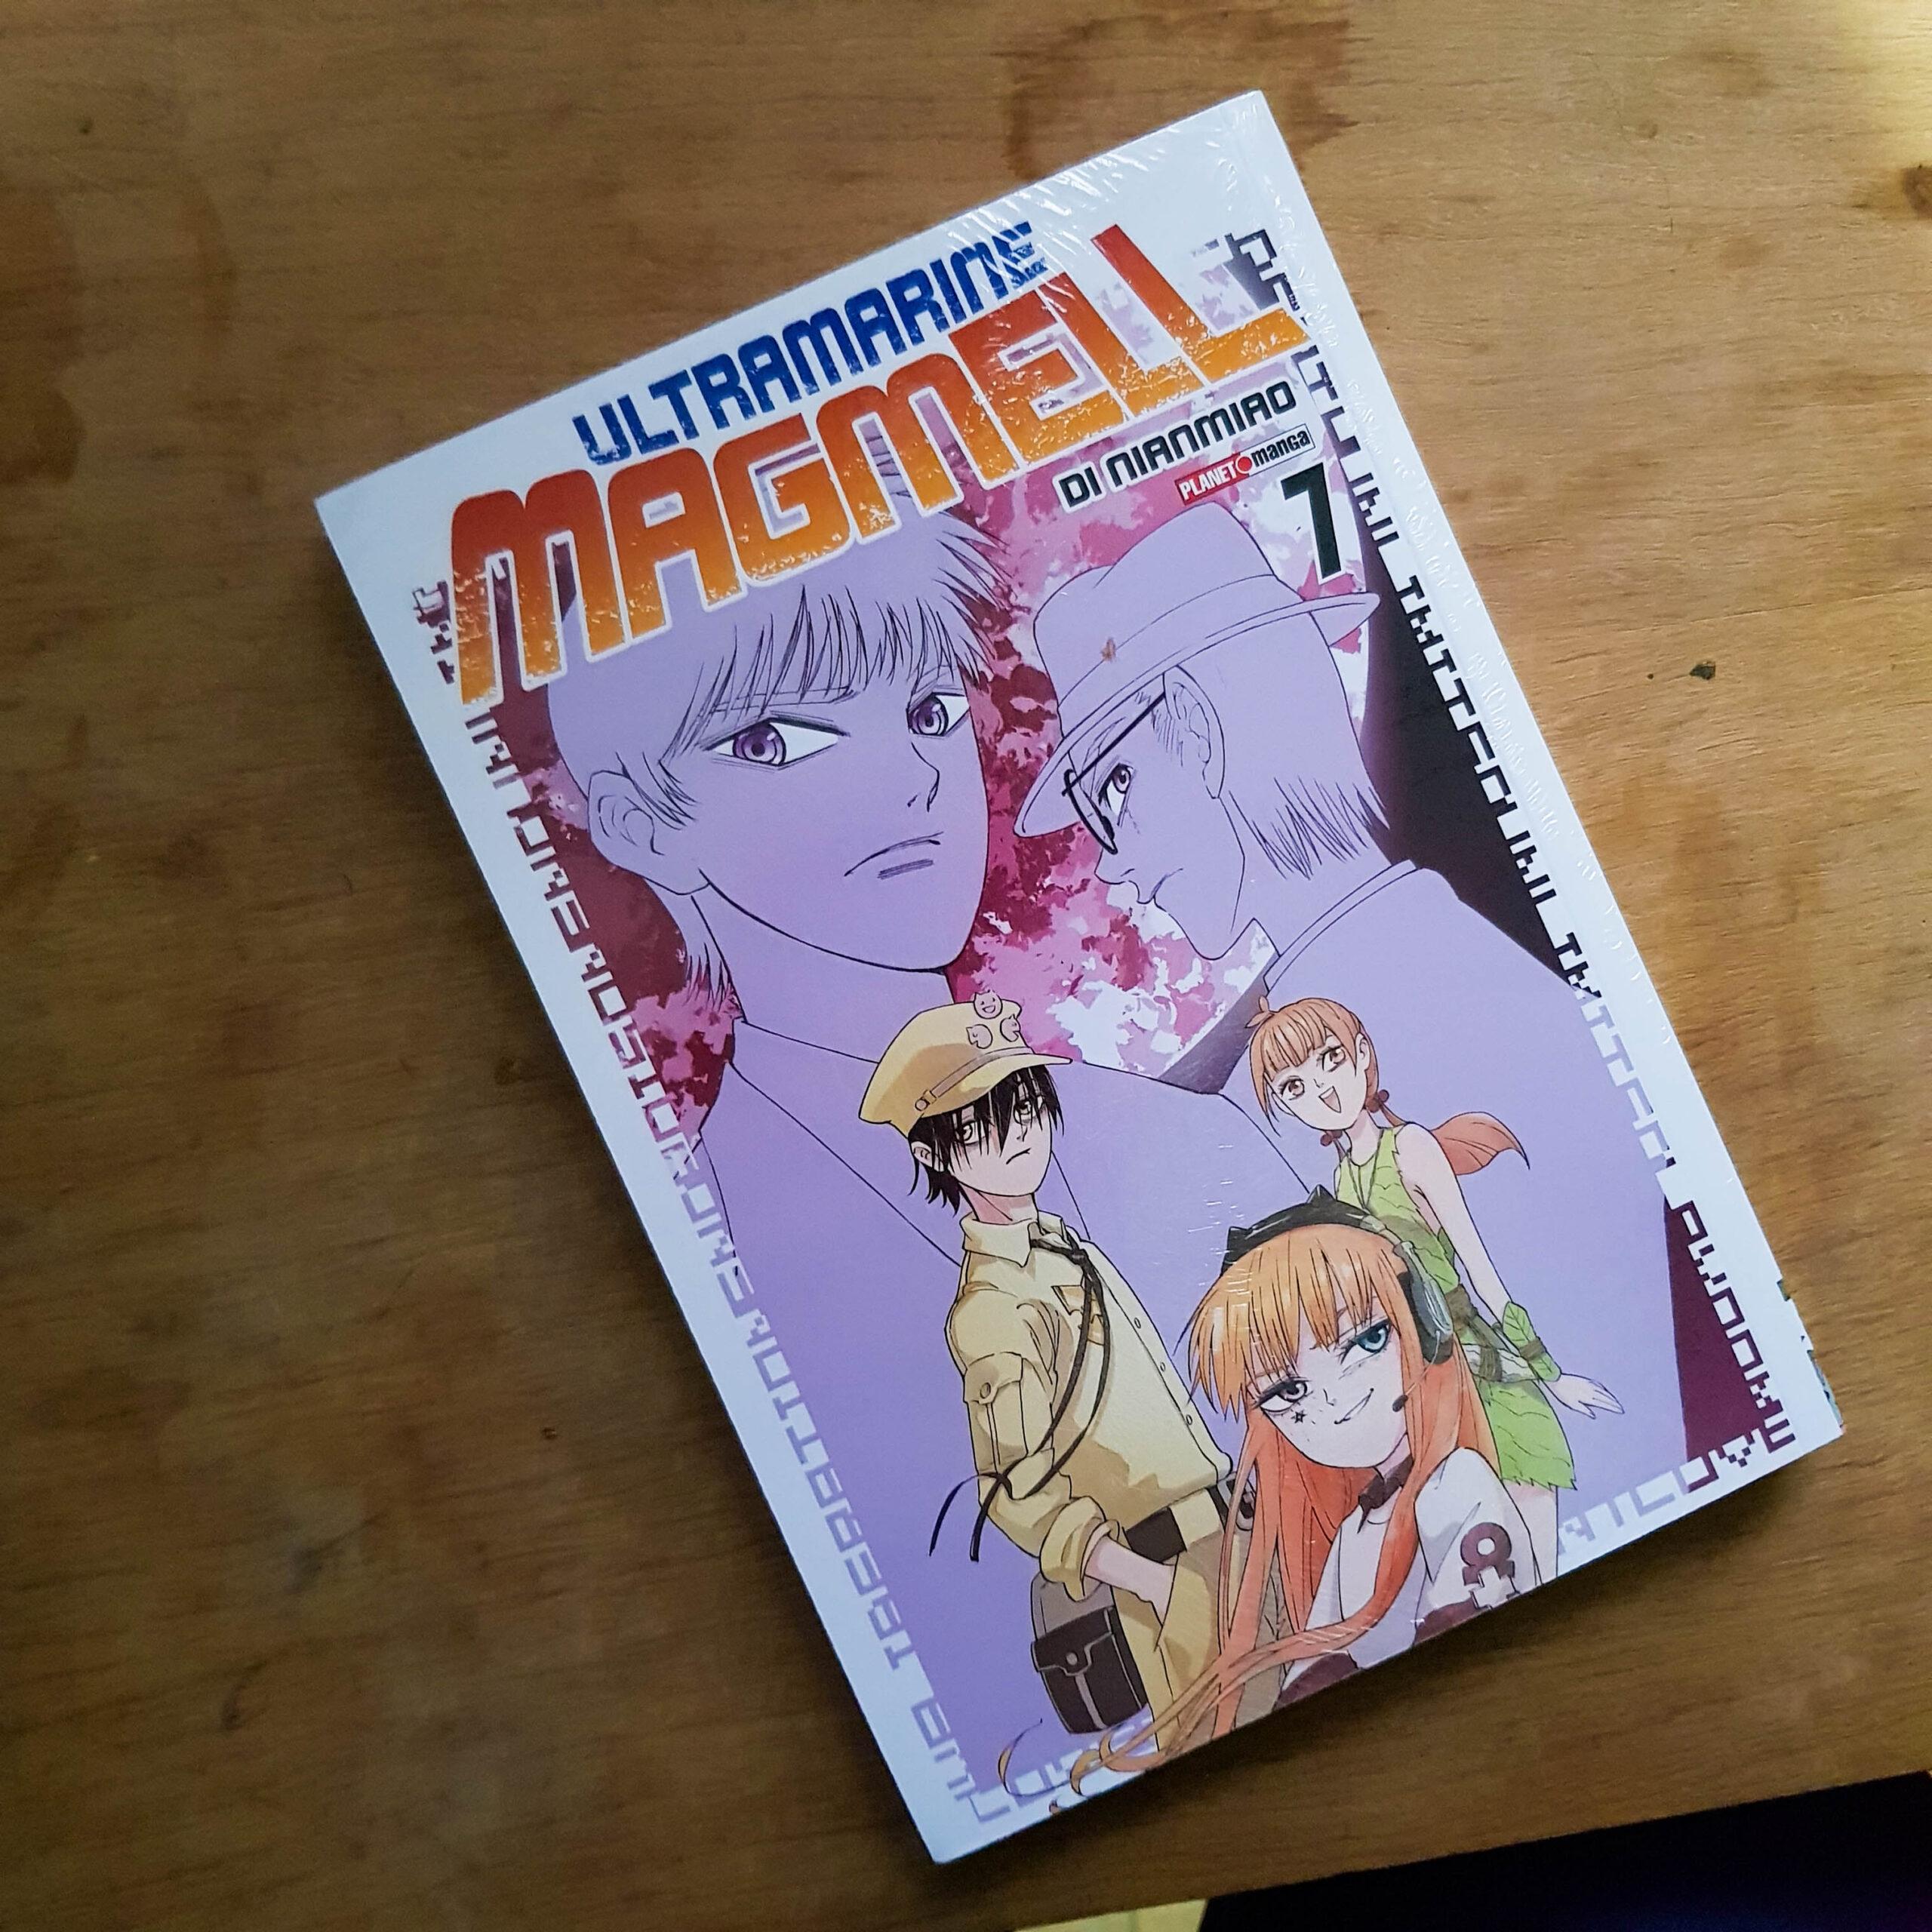 Ultramarine Magmell - Vol.7 (Lote Onigiri Forever)